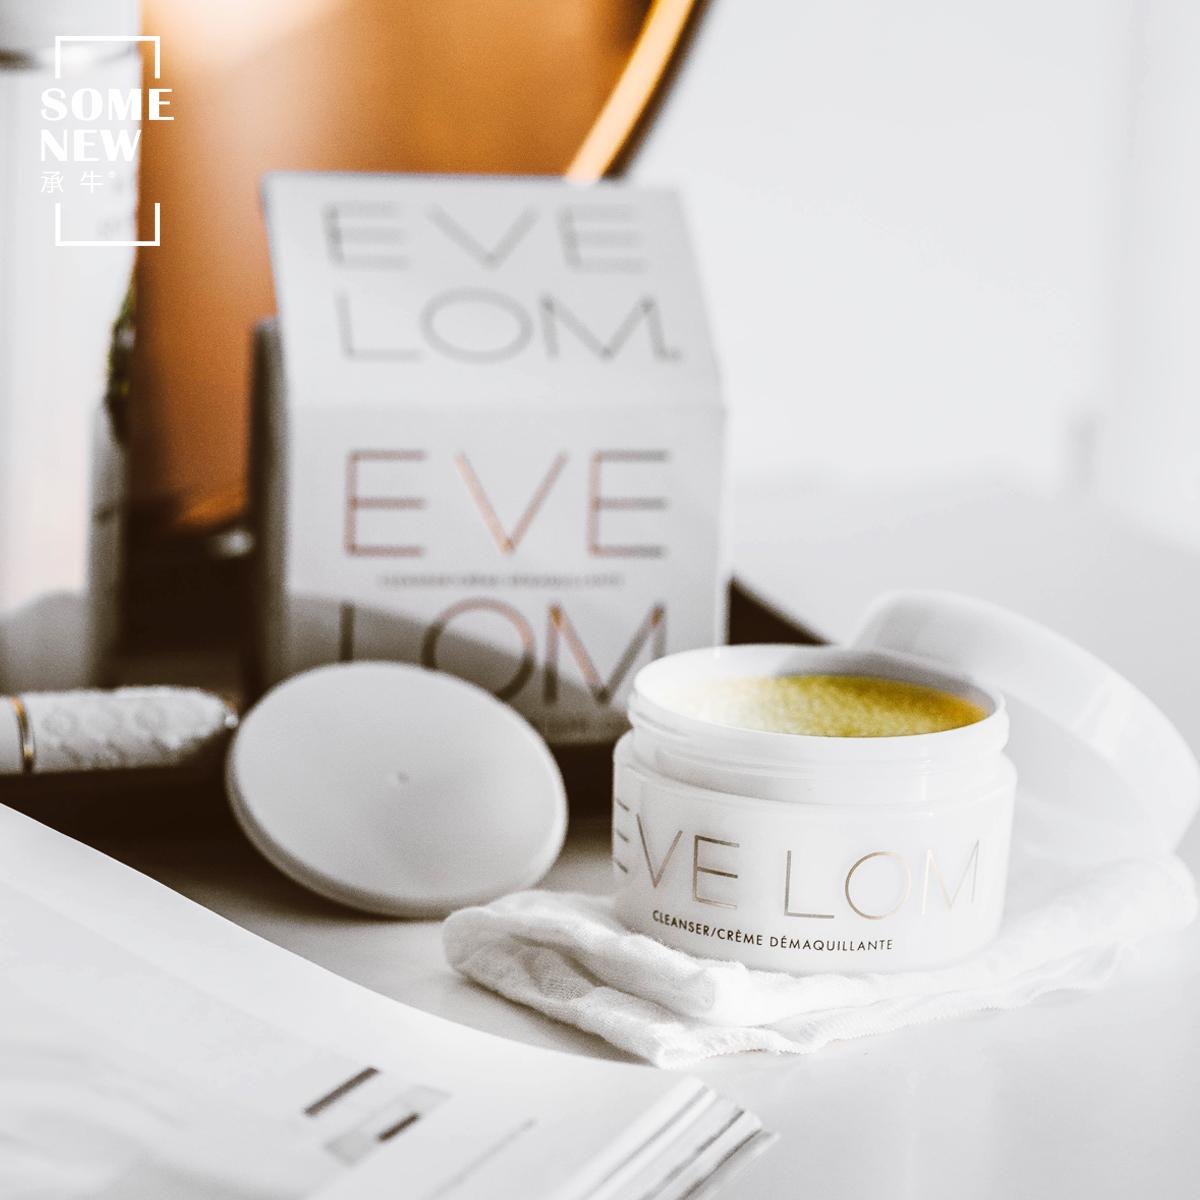 100ml清洁毛孔卸妆膏经典洁颜霜LOMEVE英国级卸妆体验SPA